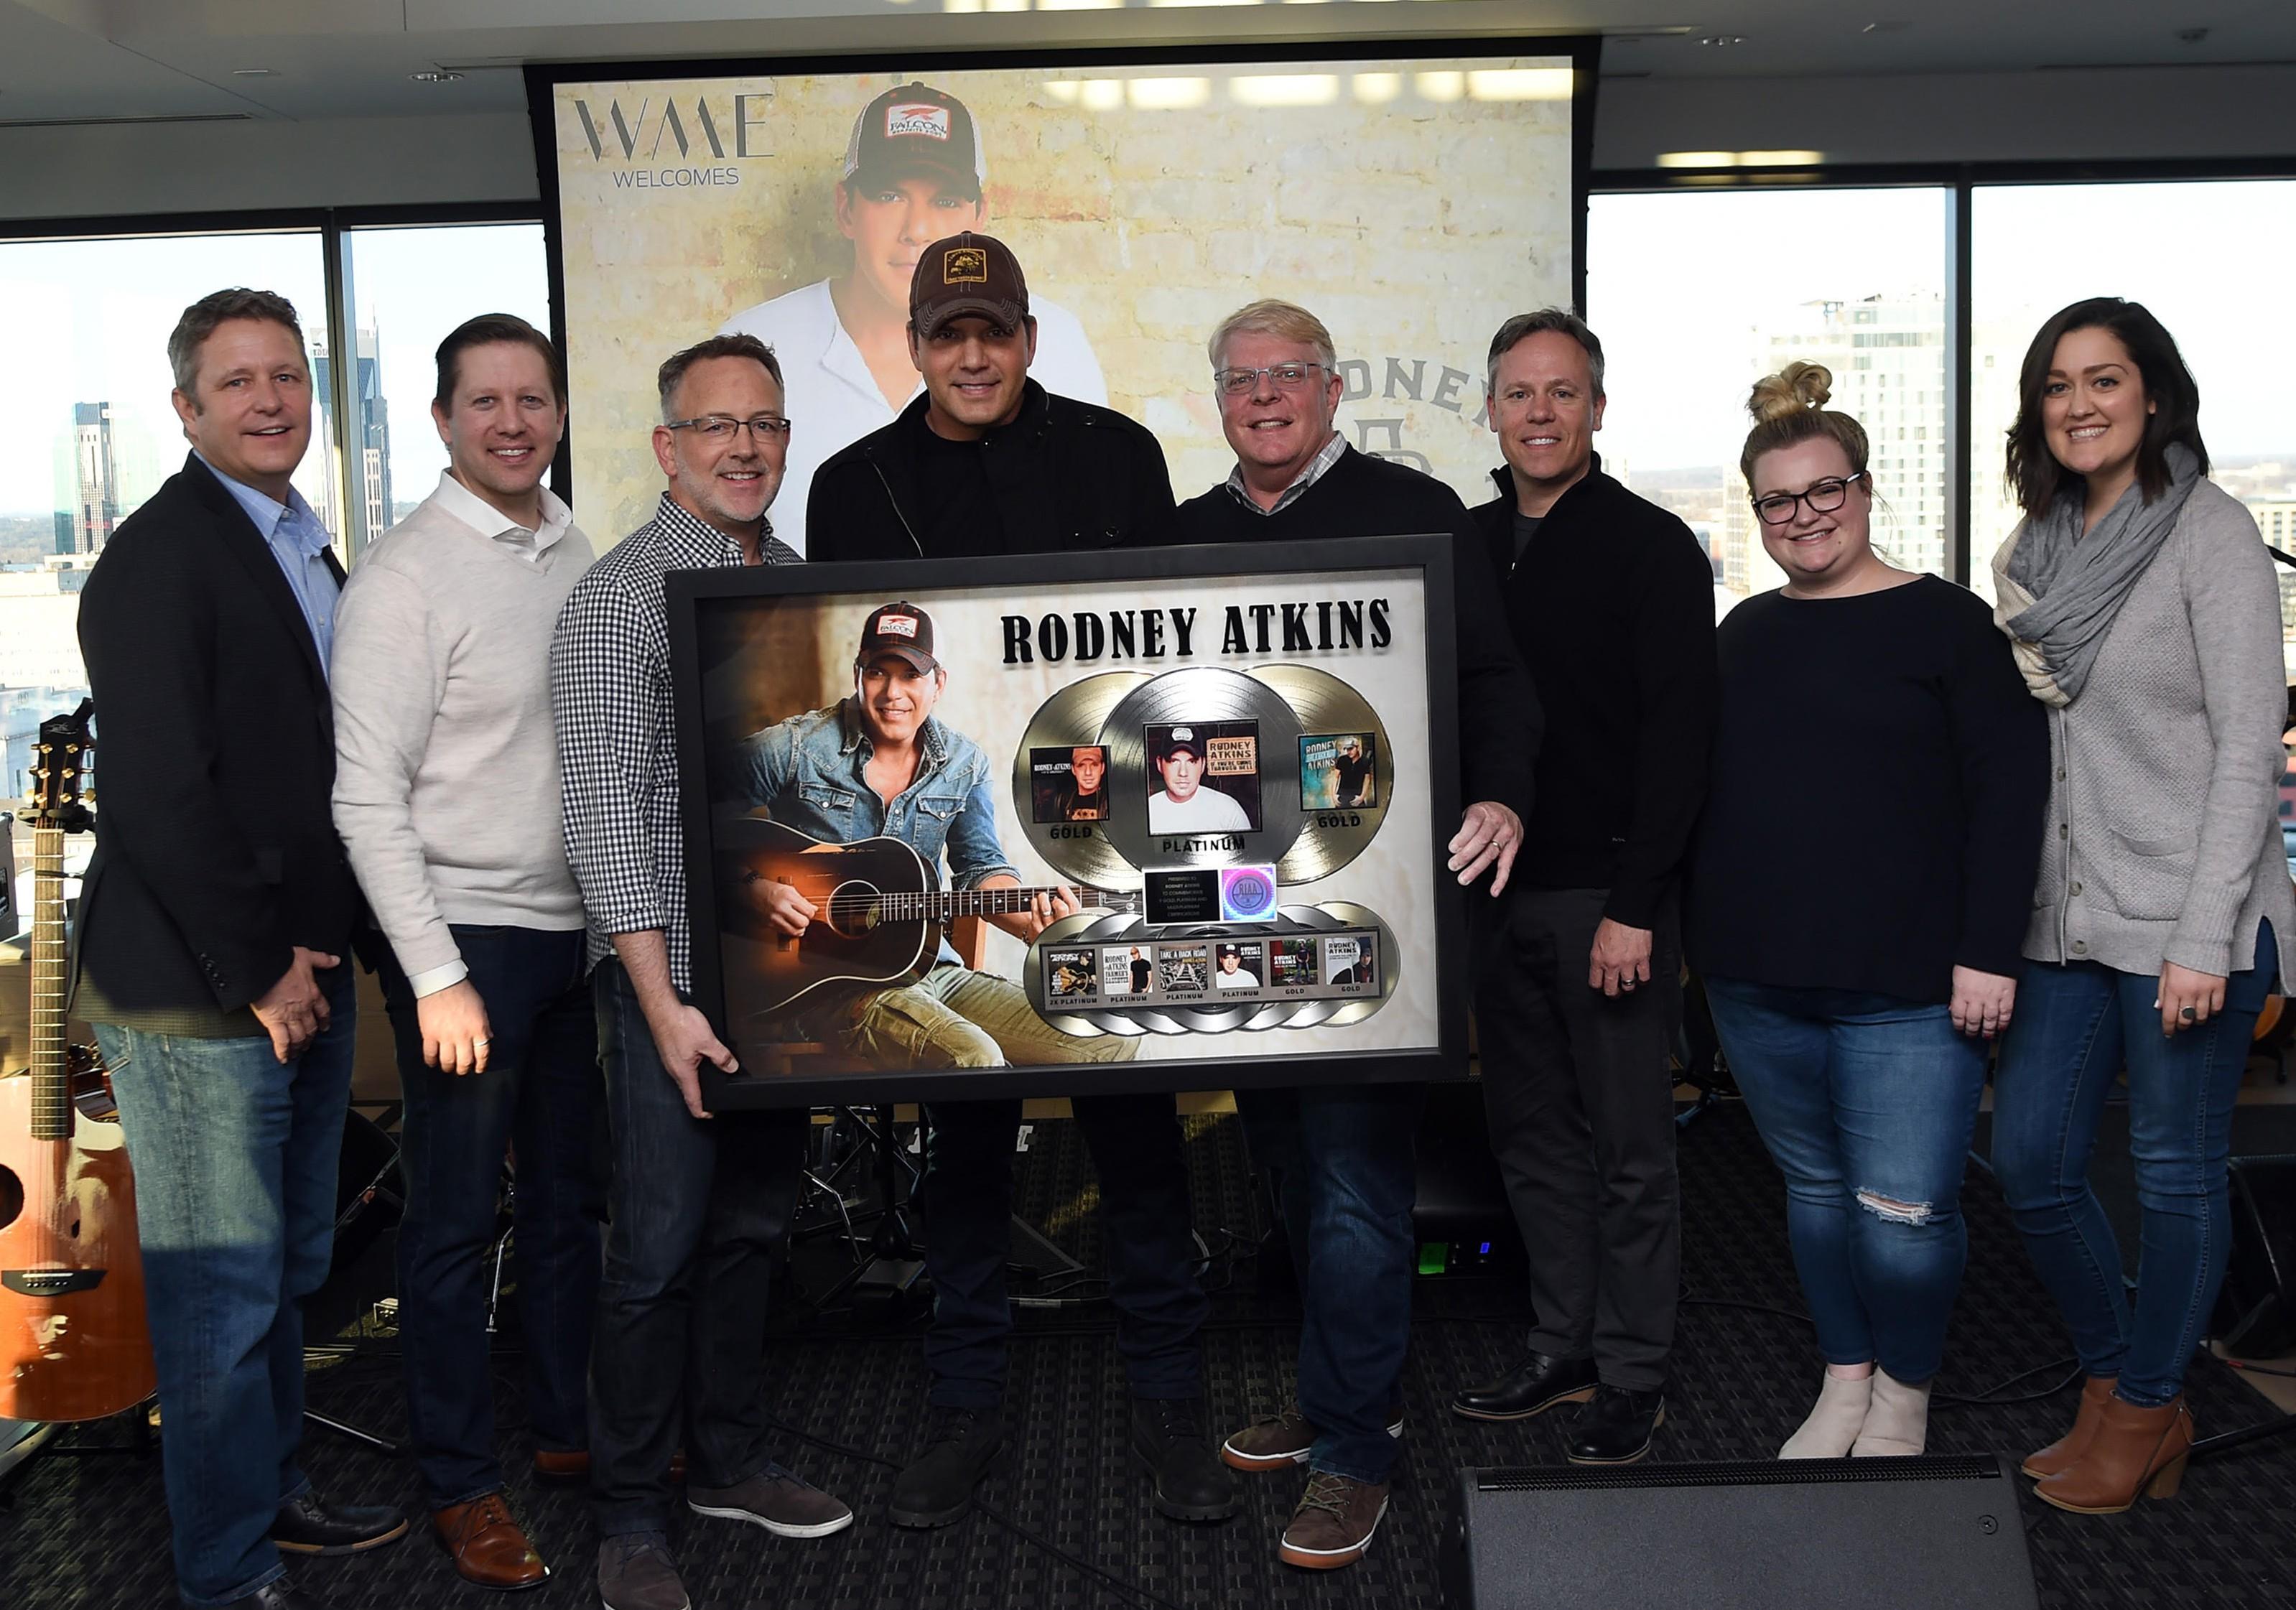 Rodney Atkins platinum plaque presentation